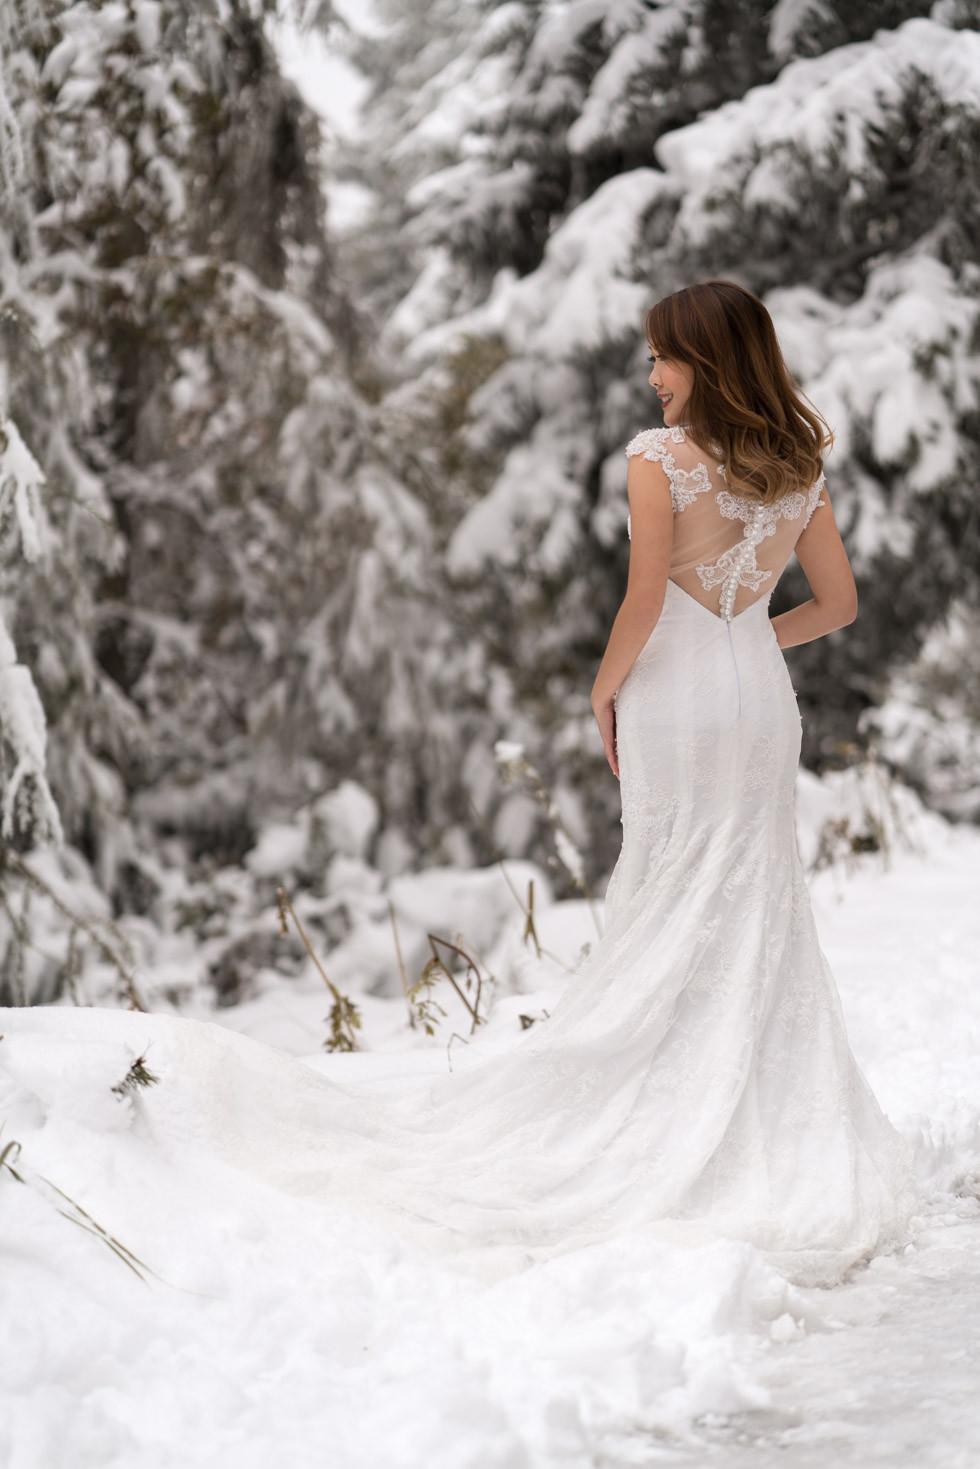 Snow White 718am Wedding Photography-002